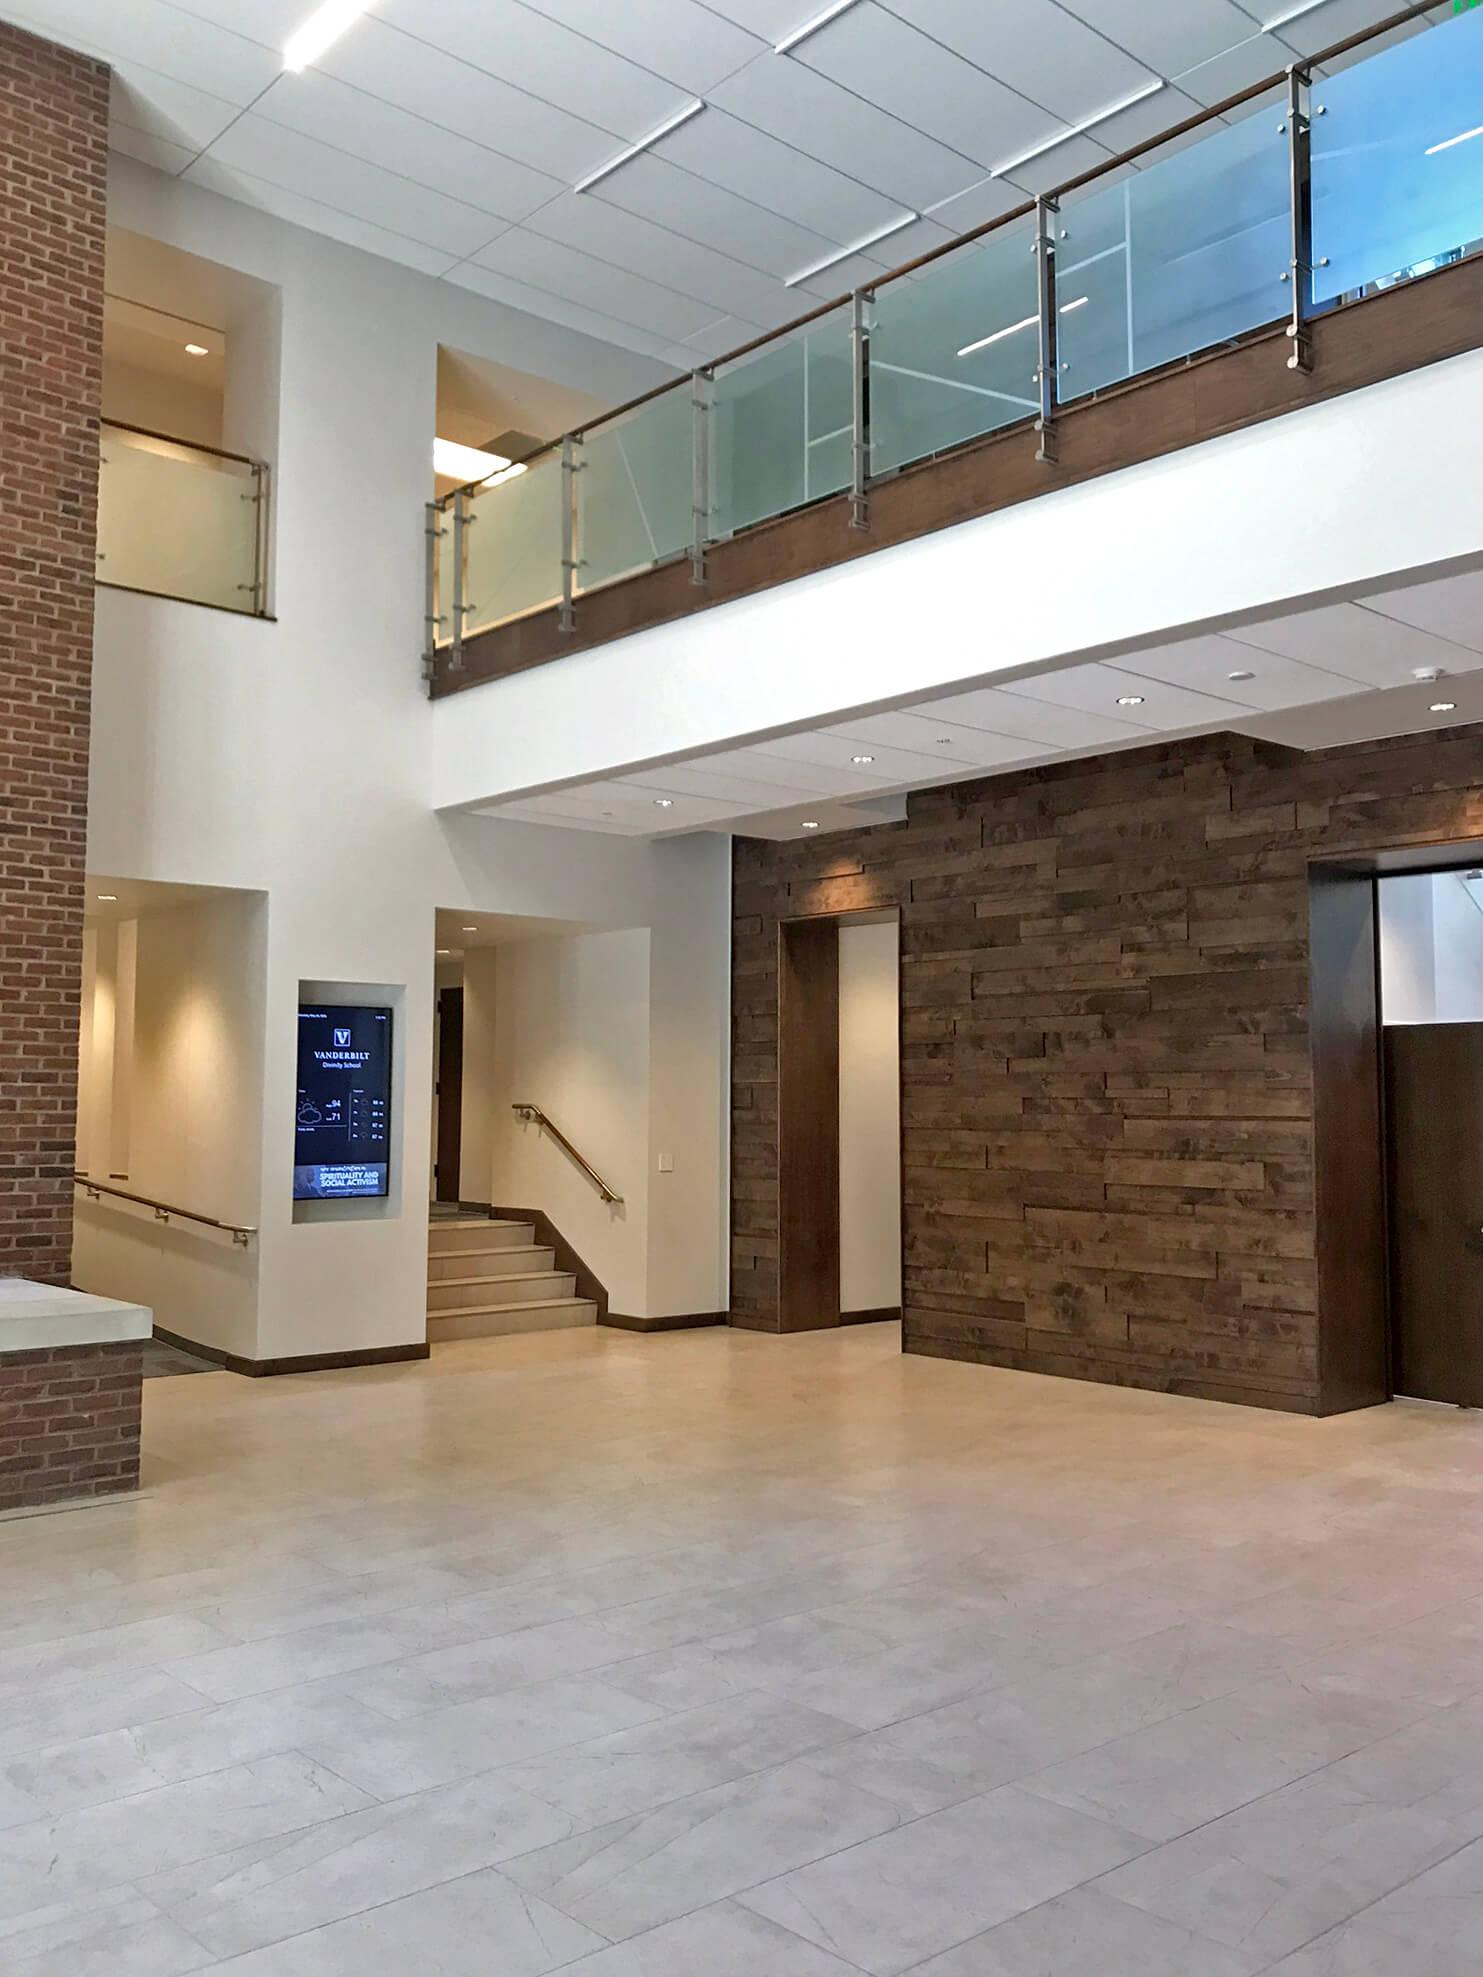 Kubit Glass Railing At Market Axess Nyc: Vanderbilt Divinity School Selects Kubit Railing For The Main Staircase